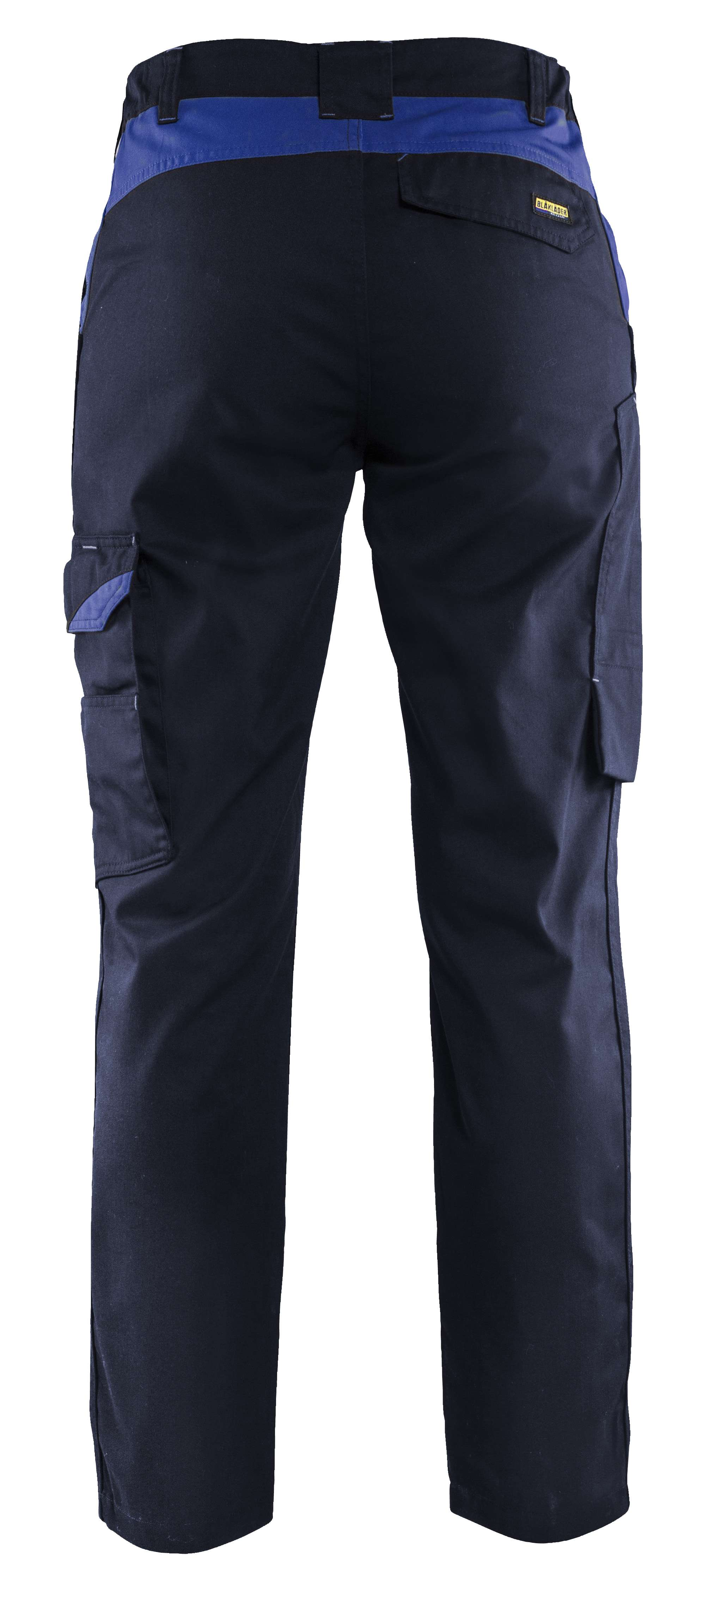 Blaklader Broeken 71041800 marineblauw-korenblauw(8985)